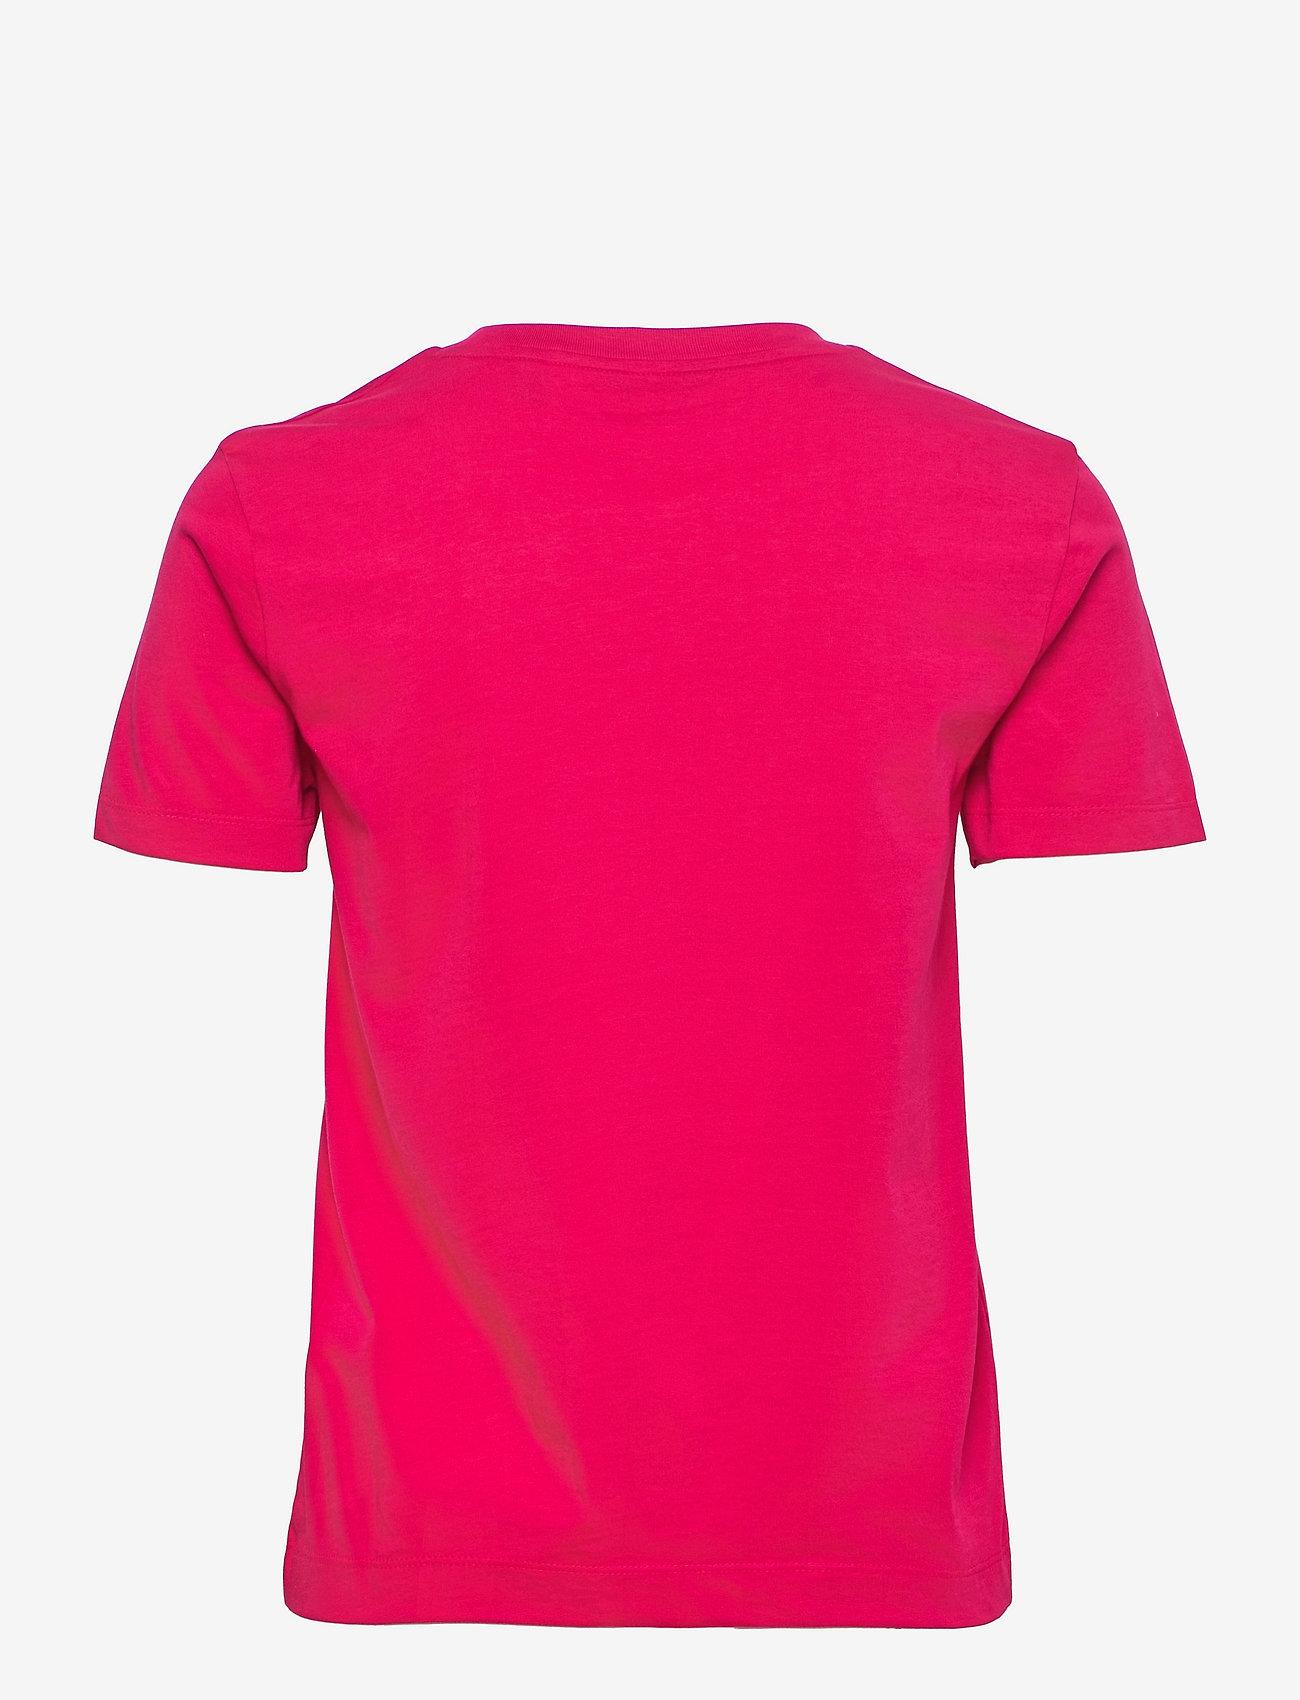 GANT - ARCHIVE SHIELD SS T-SHIRT - t-shirts - raspberry red - 1